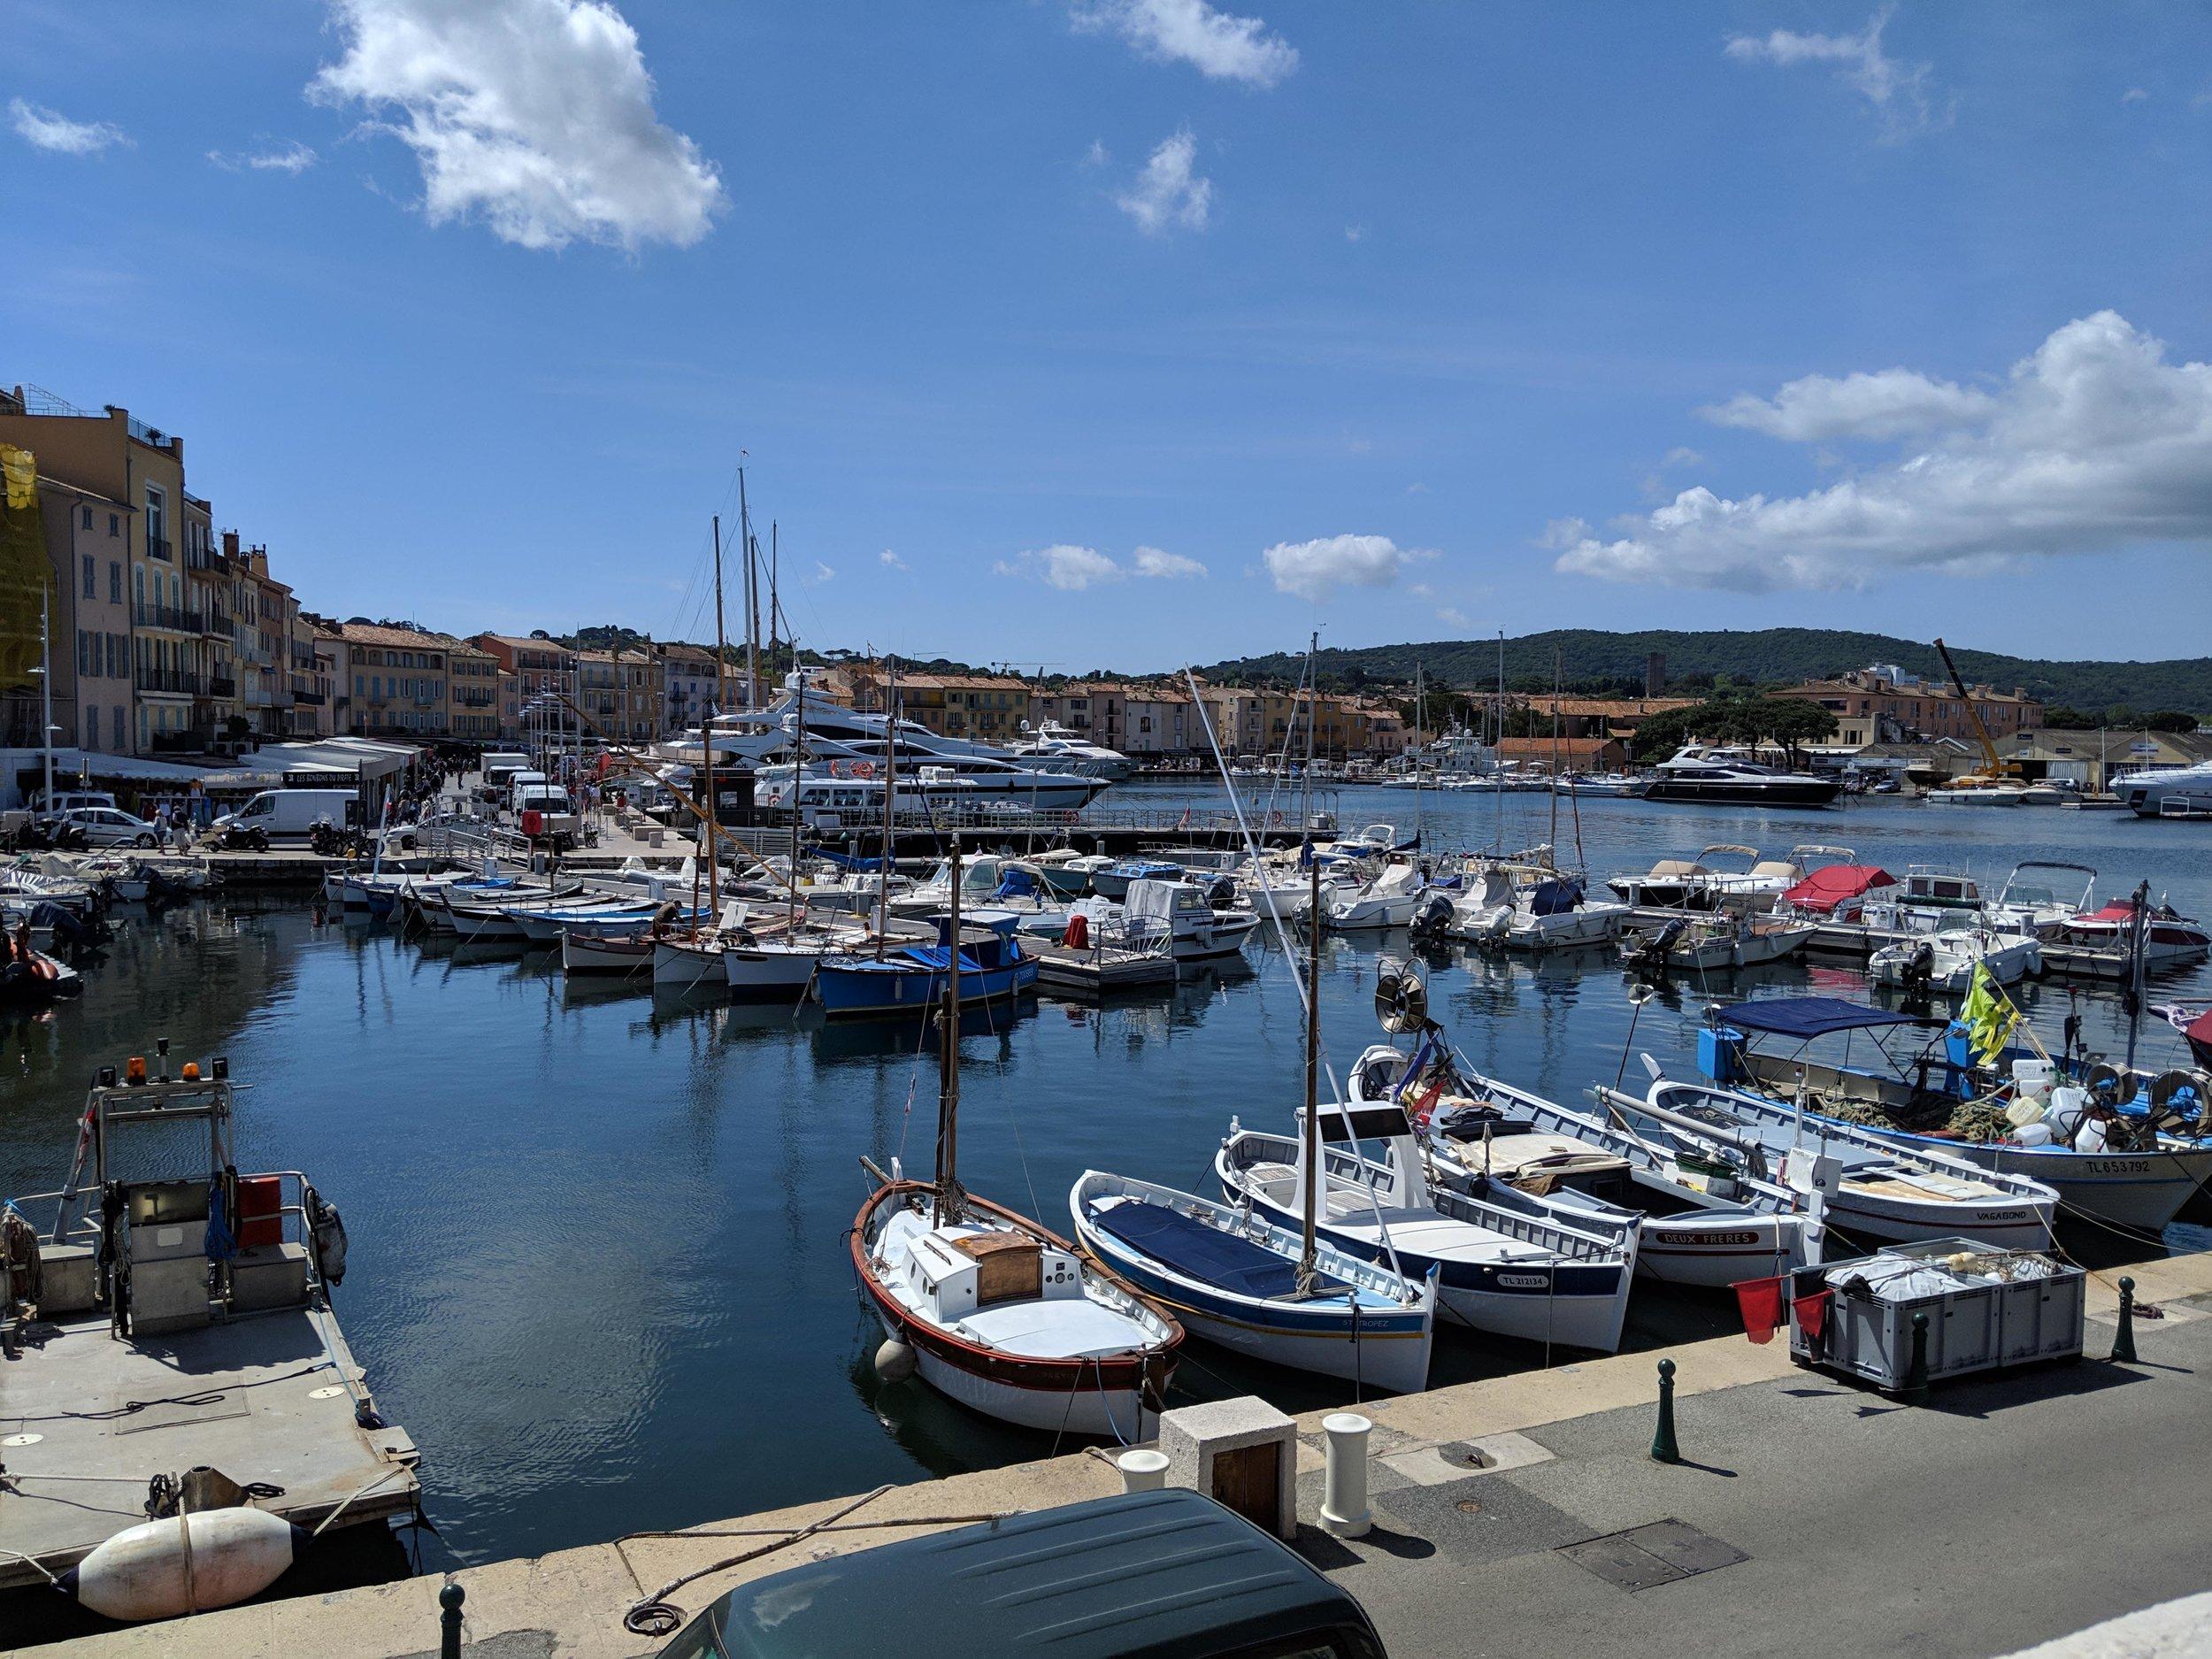 Busy St Tropez harbor